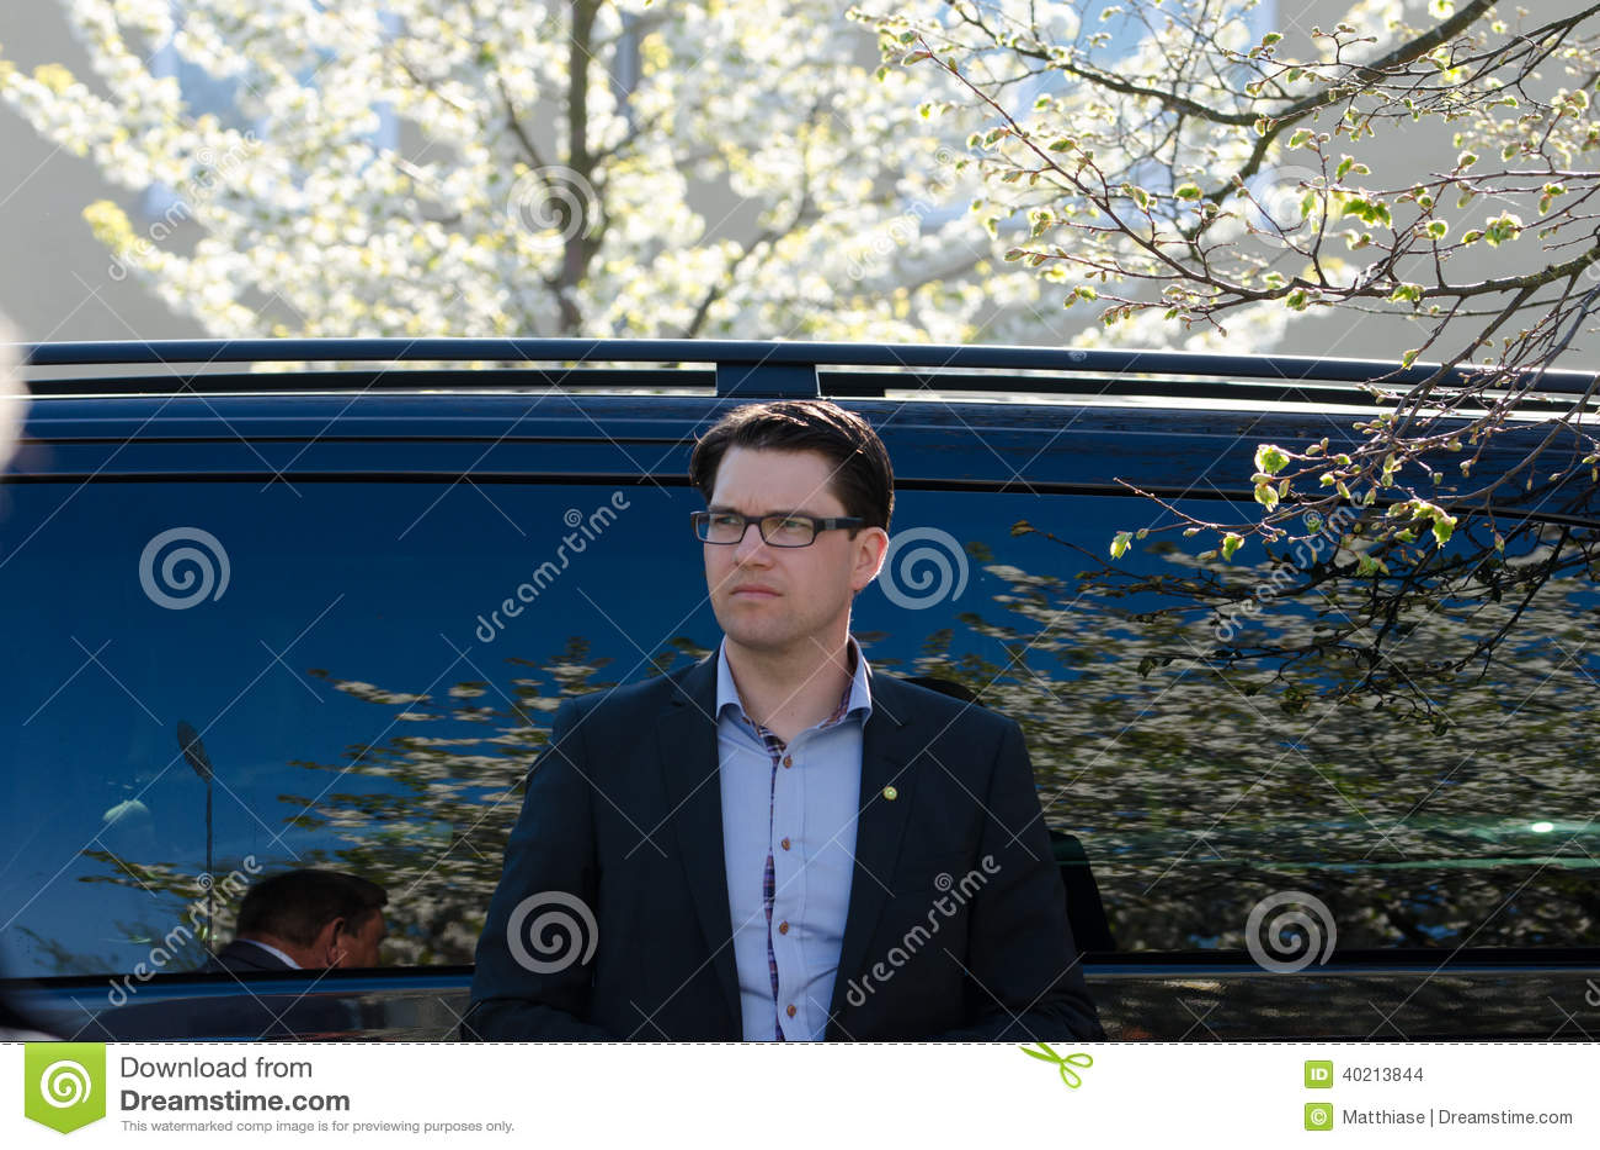 Jimmie Kesson Current Leader Sweden Democrats